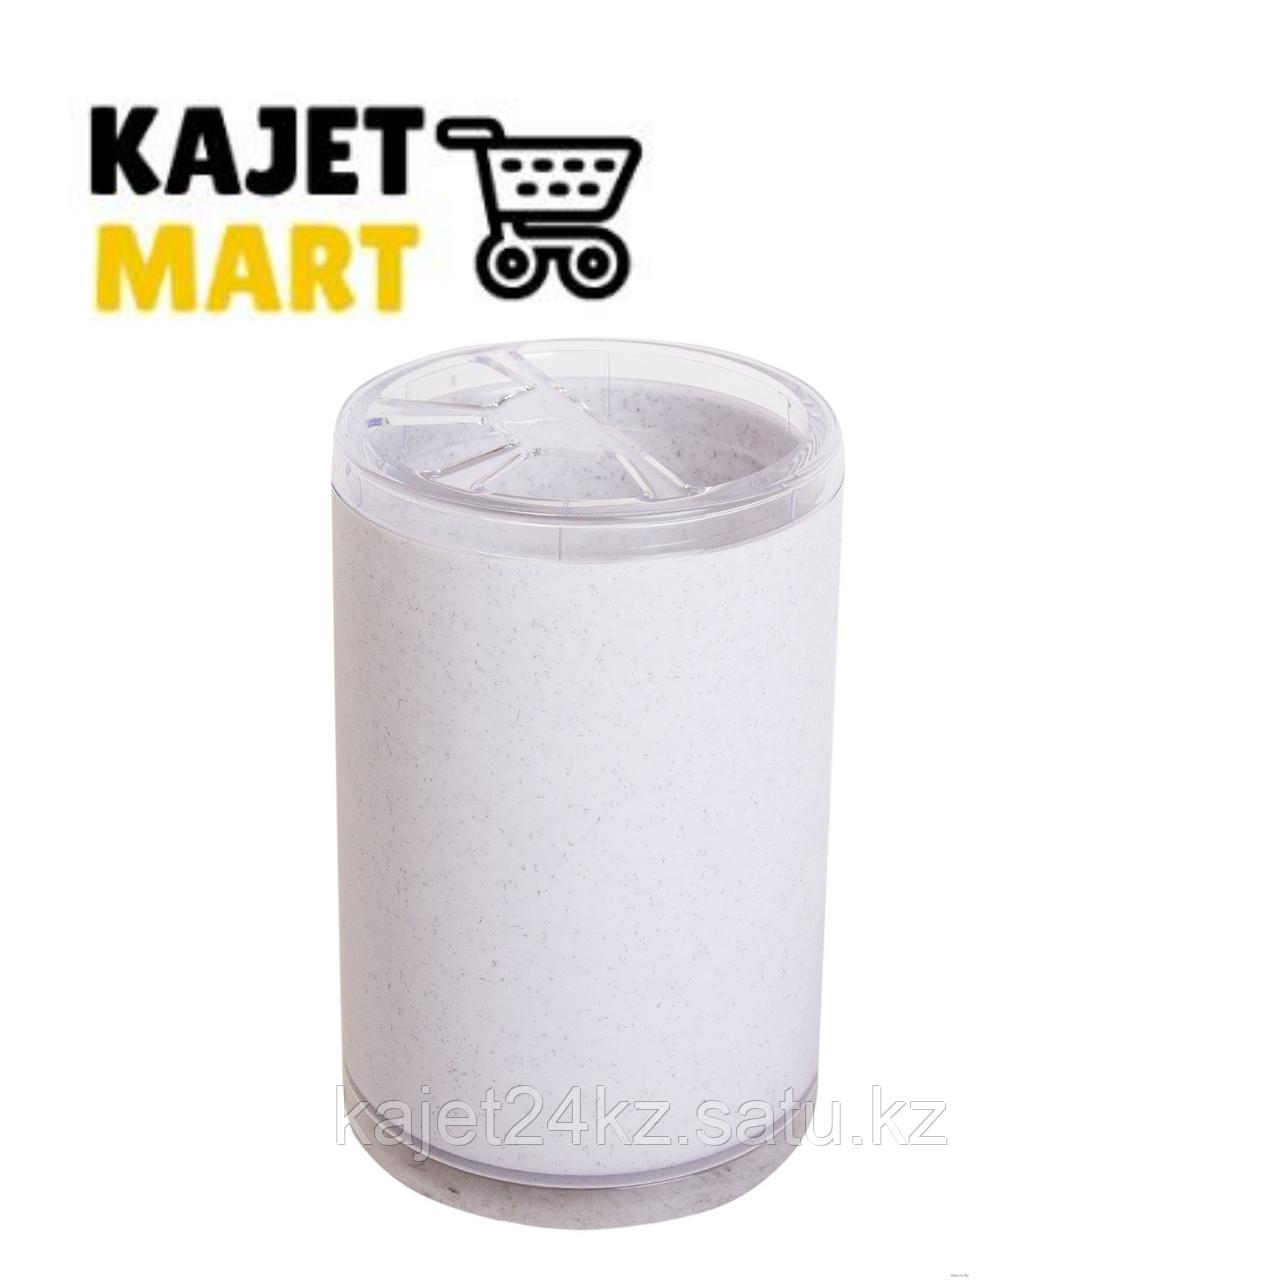 "Подставка для зубных щеток ""Joli"" (белый мрамор)"